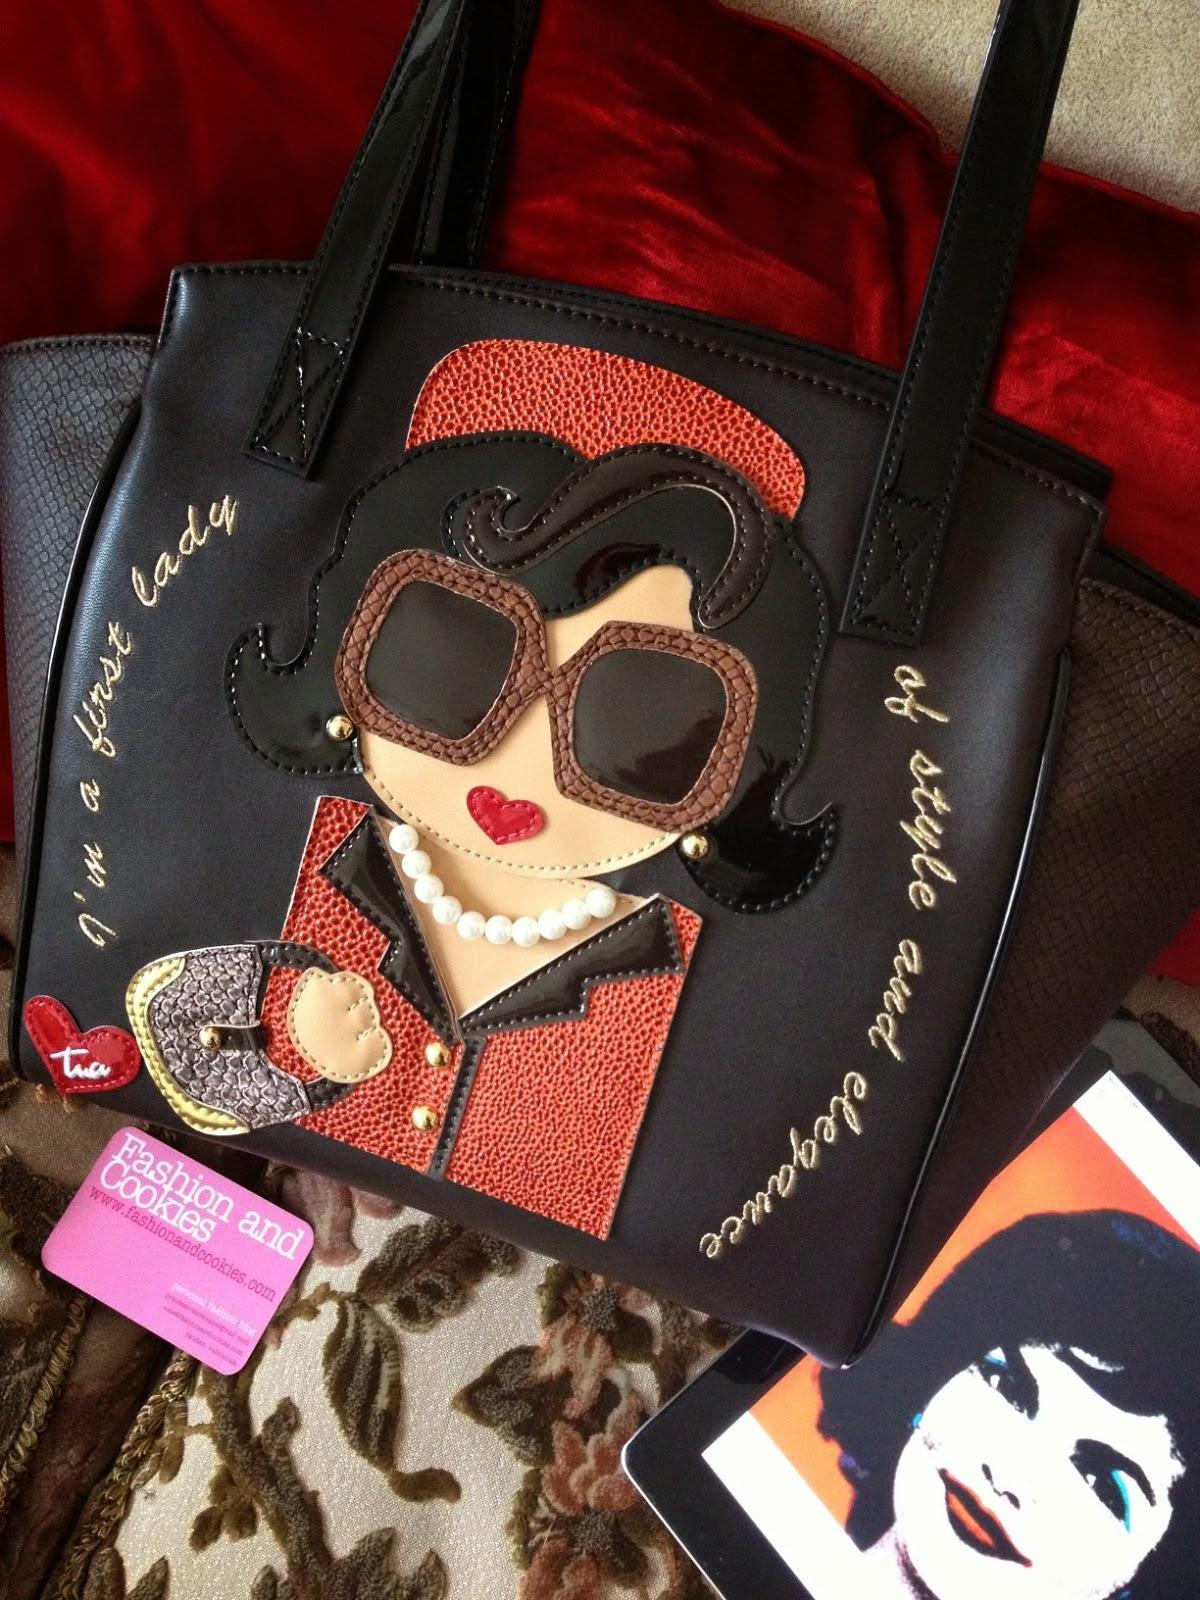 Braccialini Icons, Braccialini Tua, Jackie Kennedy bag, Fashion and Cookies, fashion blogger